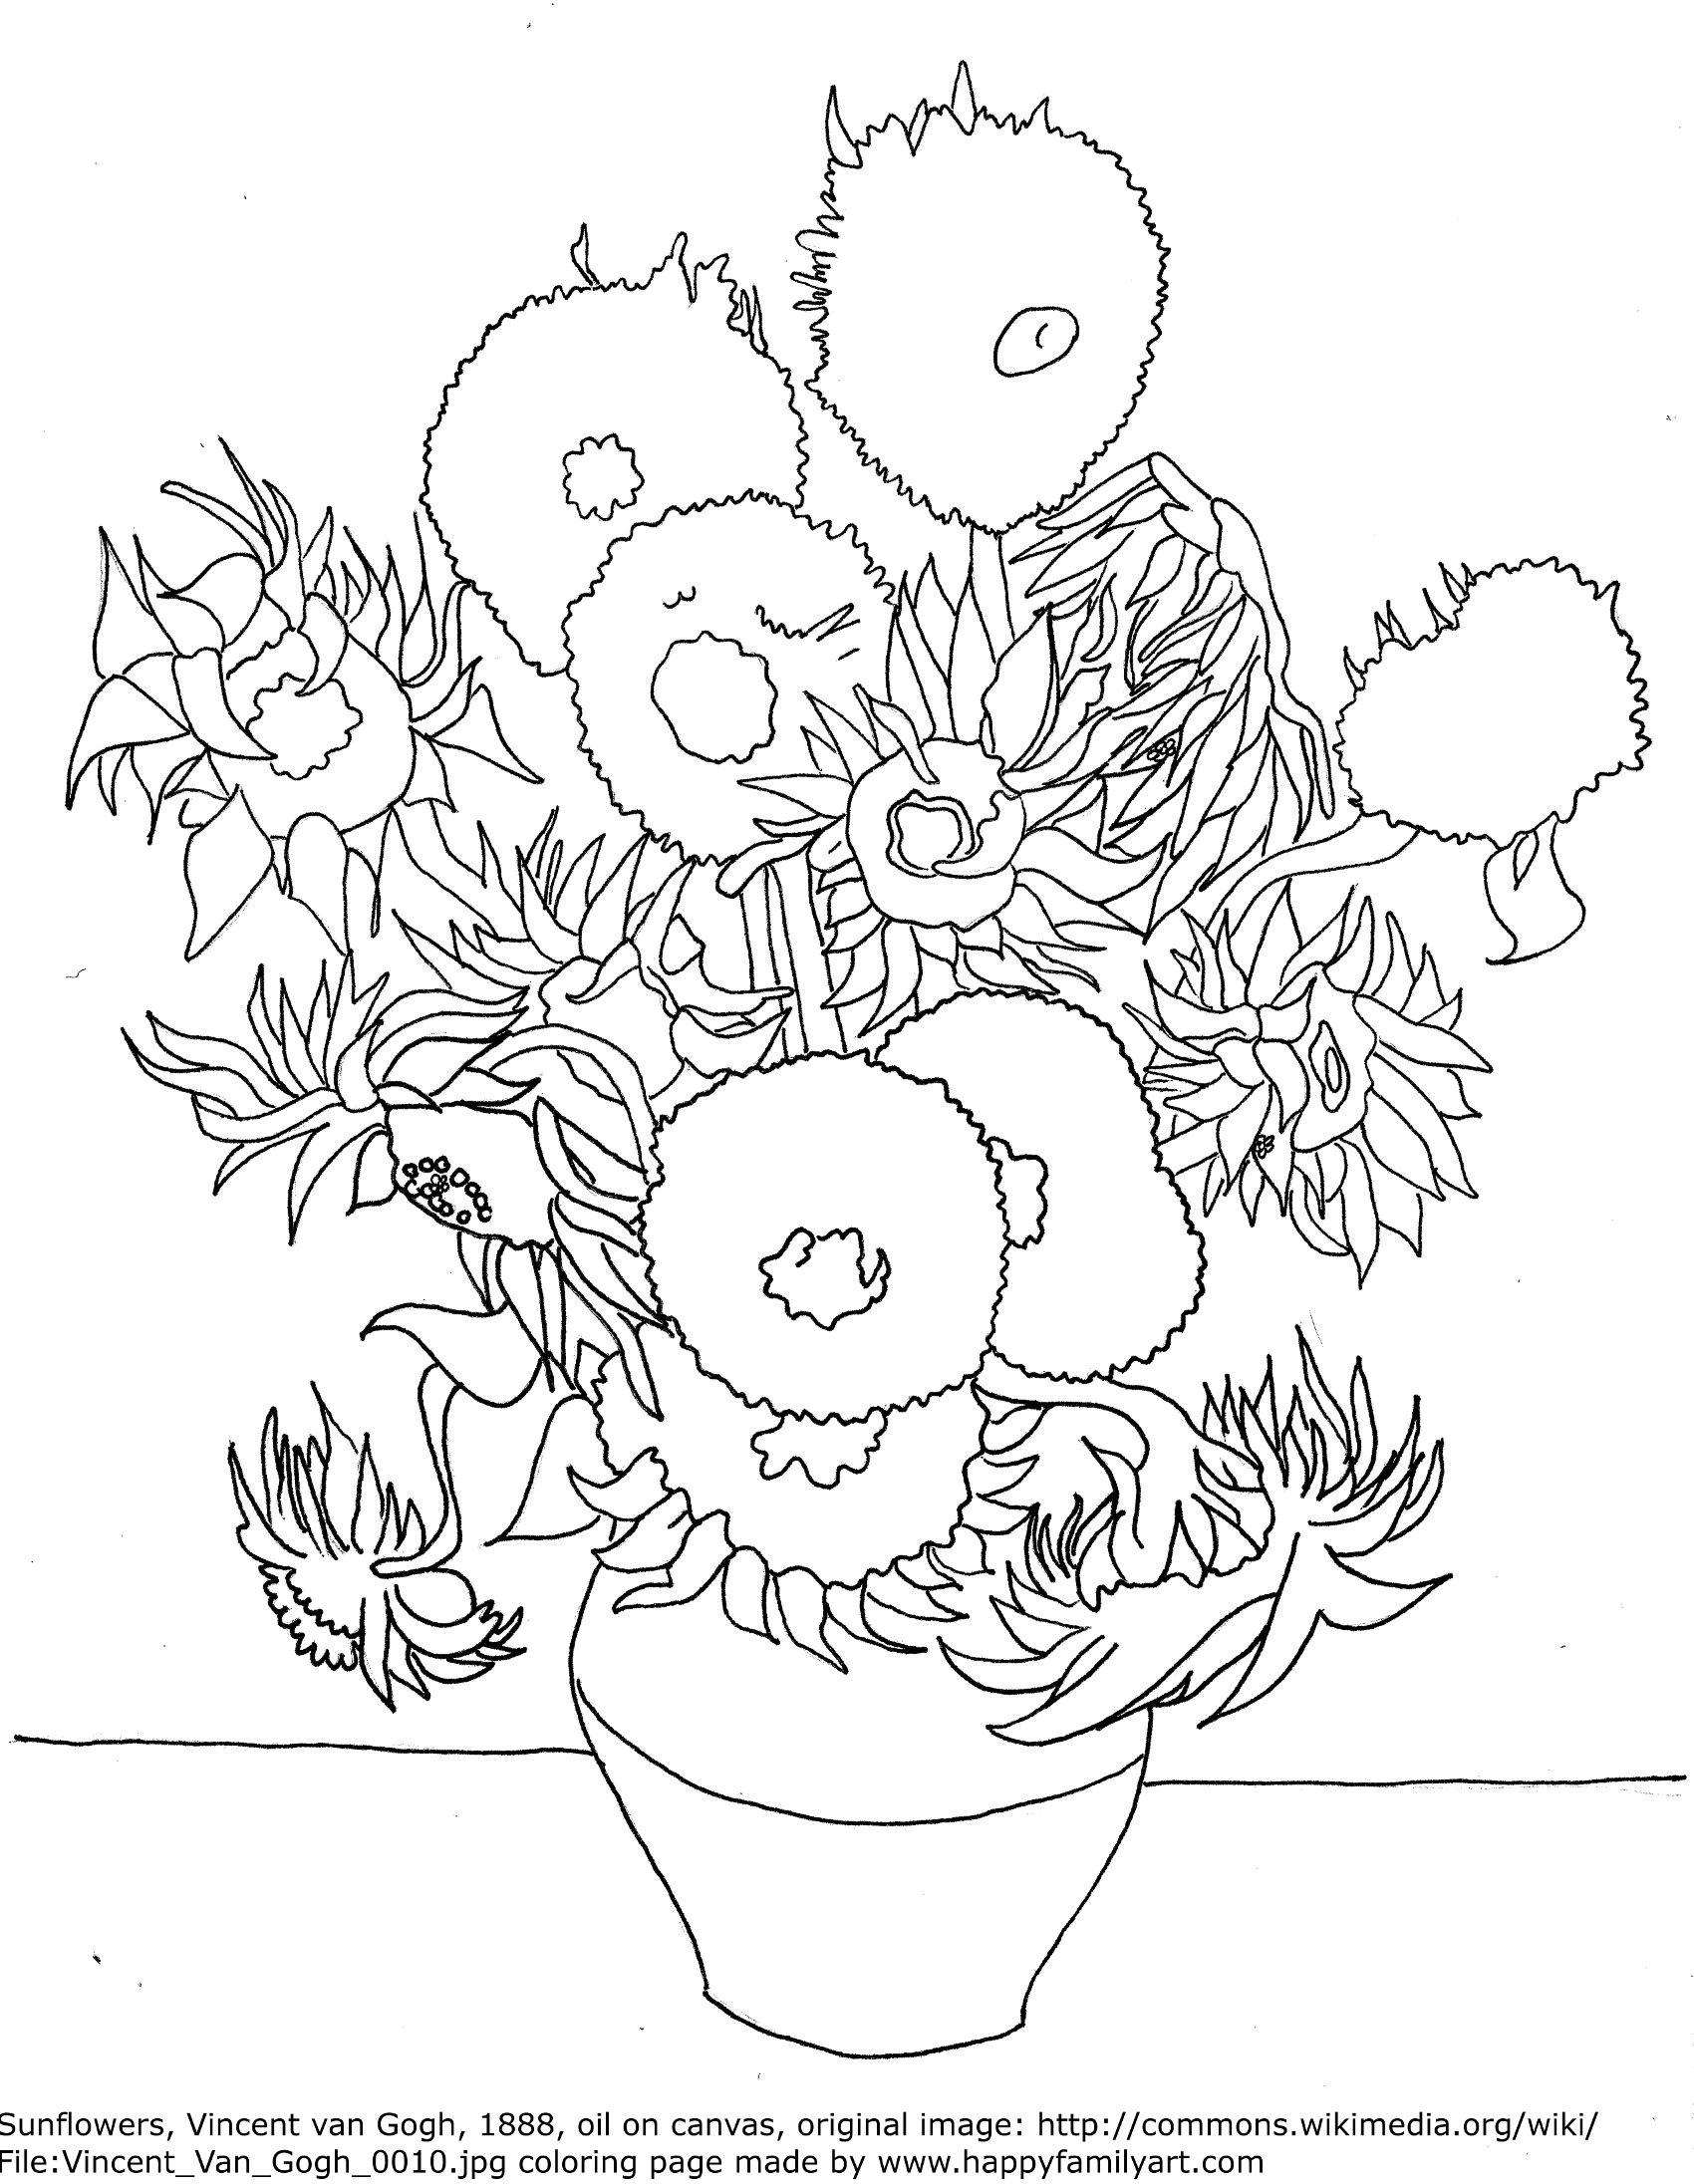 Happy Family Art Original And Fun Coloring Pages Van Gogh Coloring Sunflower Coloring Pages Van Gogh Drawings